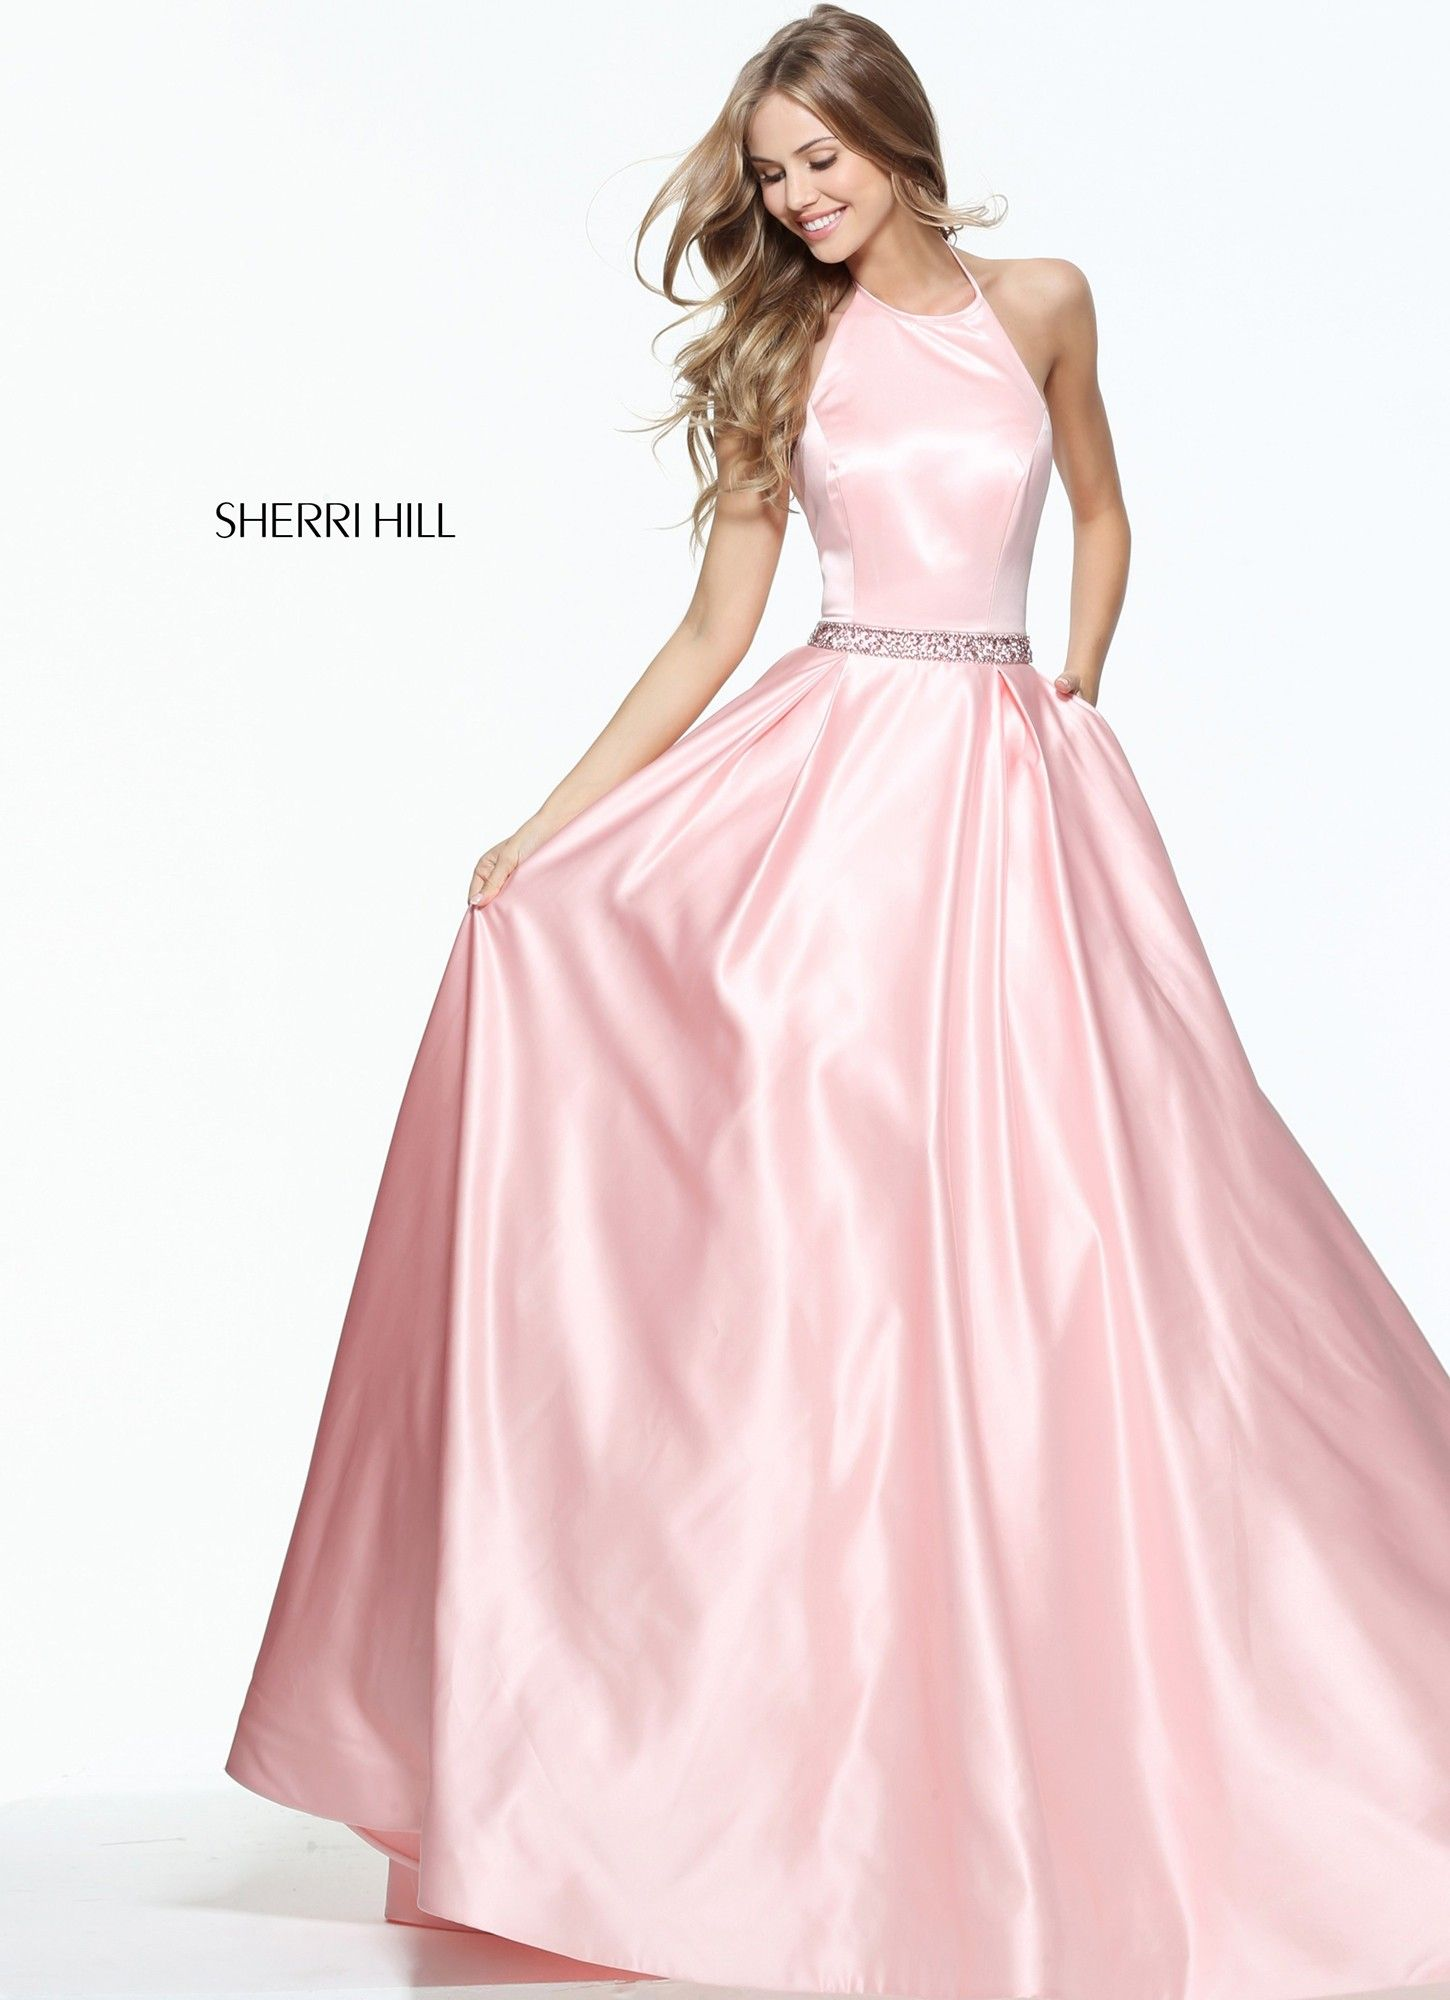 Sherri Hill 51036 Satin Halter Ball Gown | Pinterest | Vestidos de ...